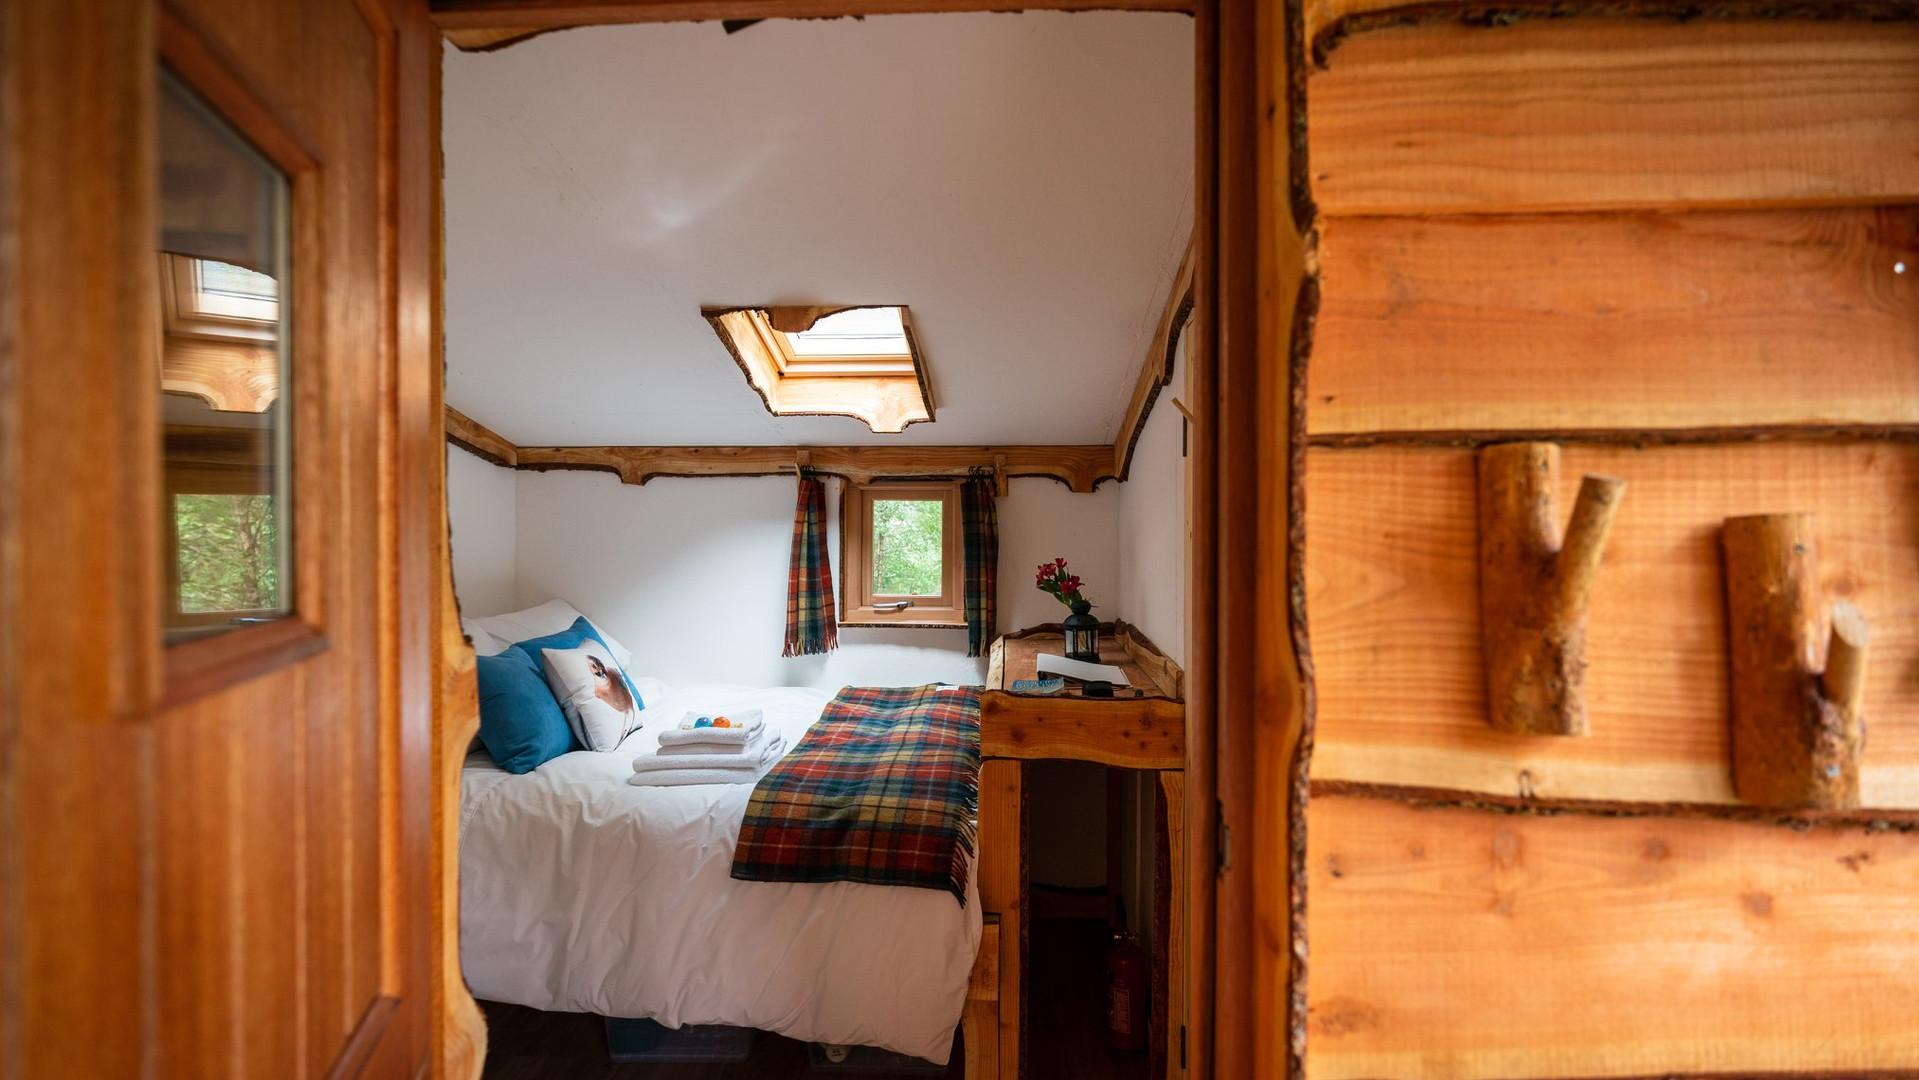 Rustic Cabin Details